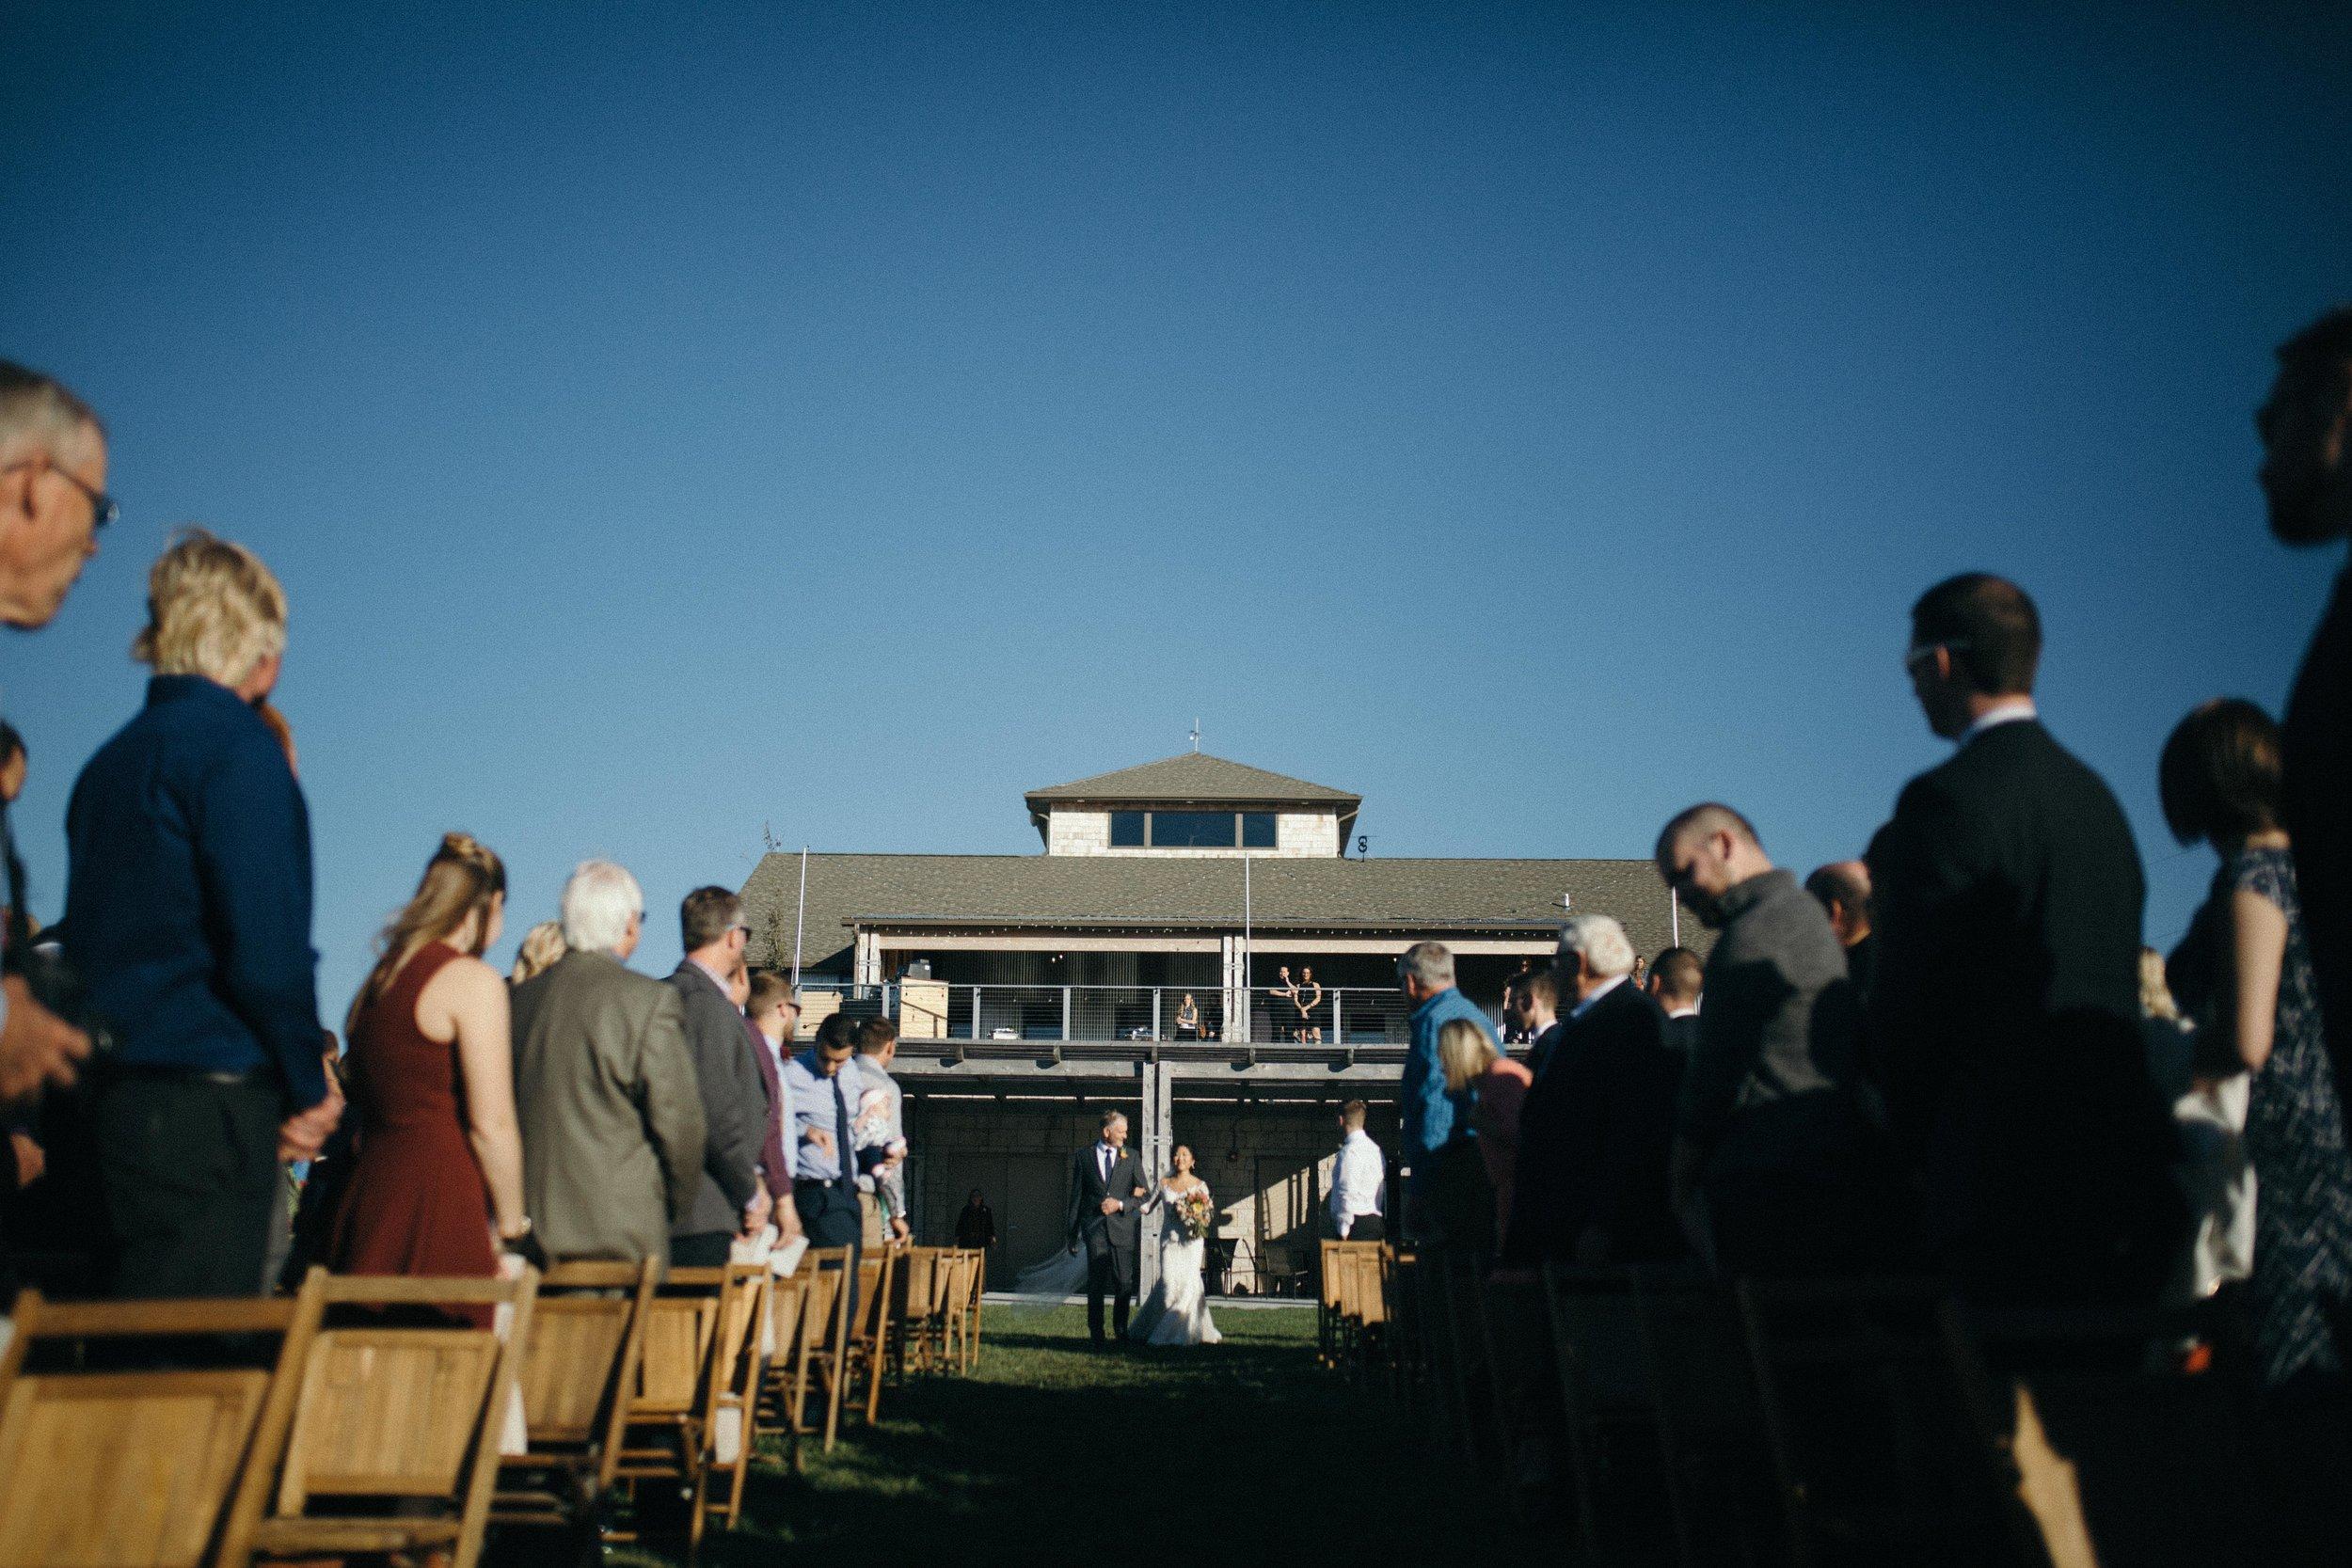 bailey-jared-wedding-blog-58.jpg